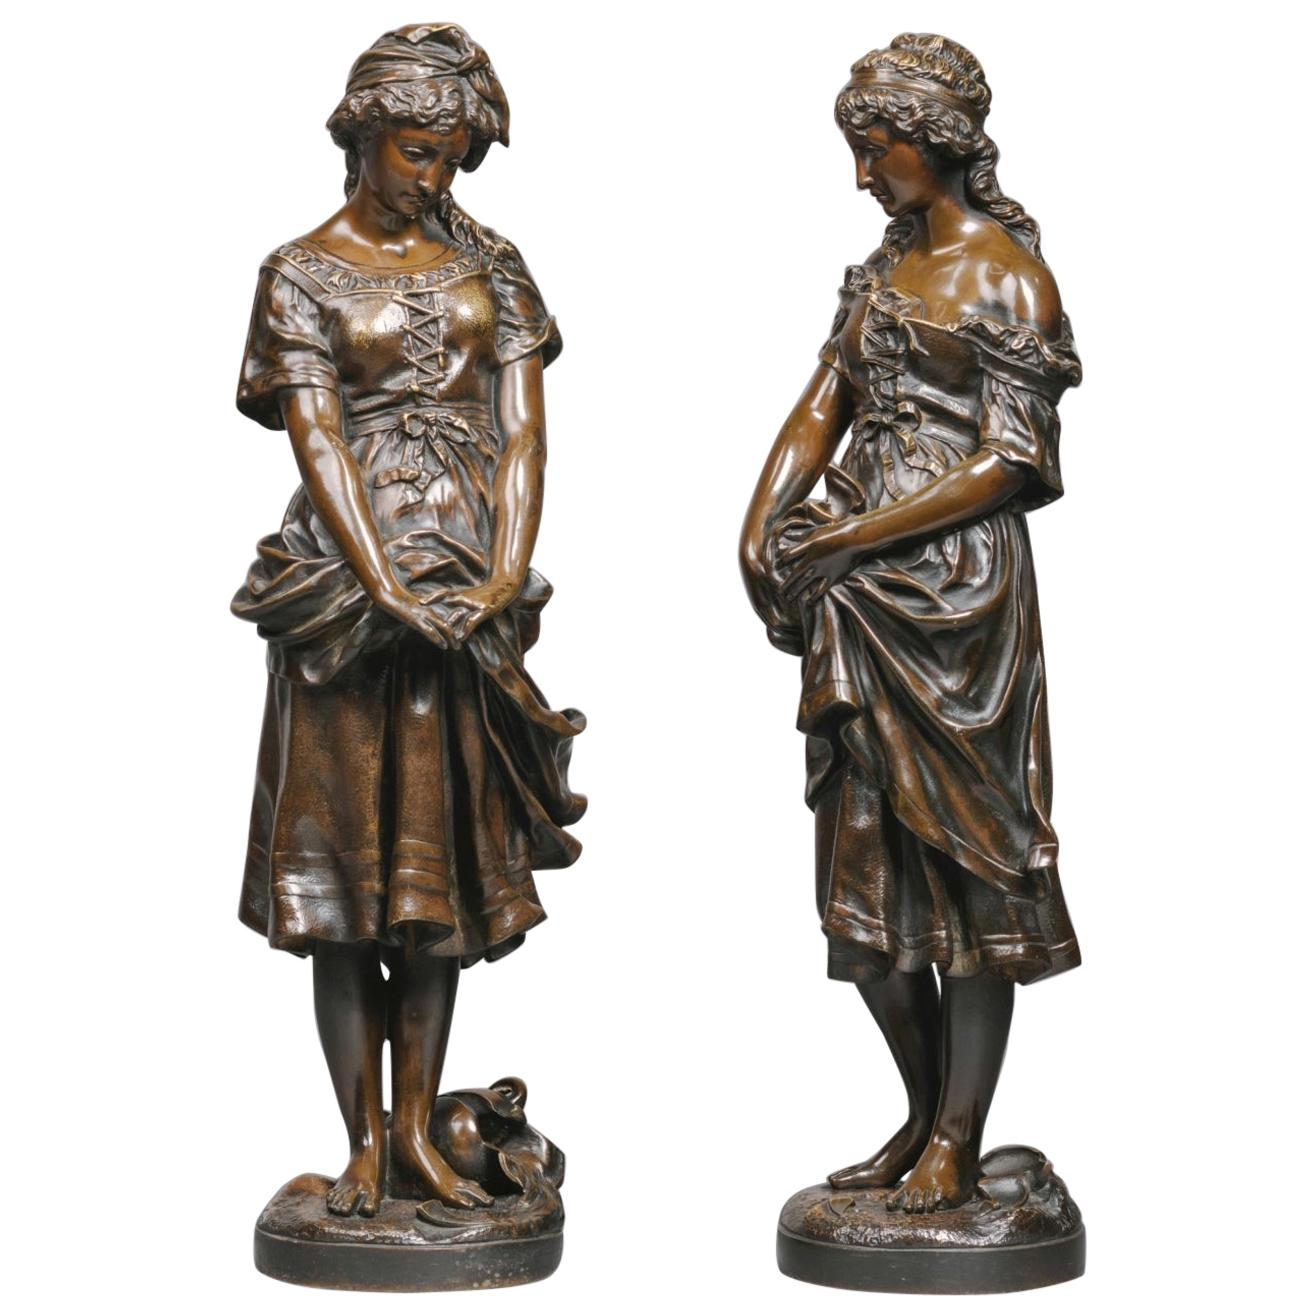 Pair of Patinated Bronze Figures by Jean-Baptiste Germain